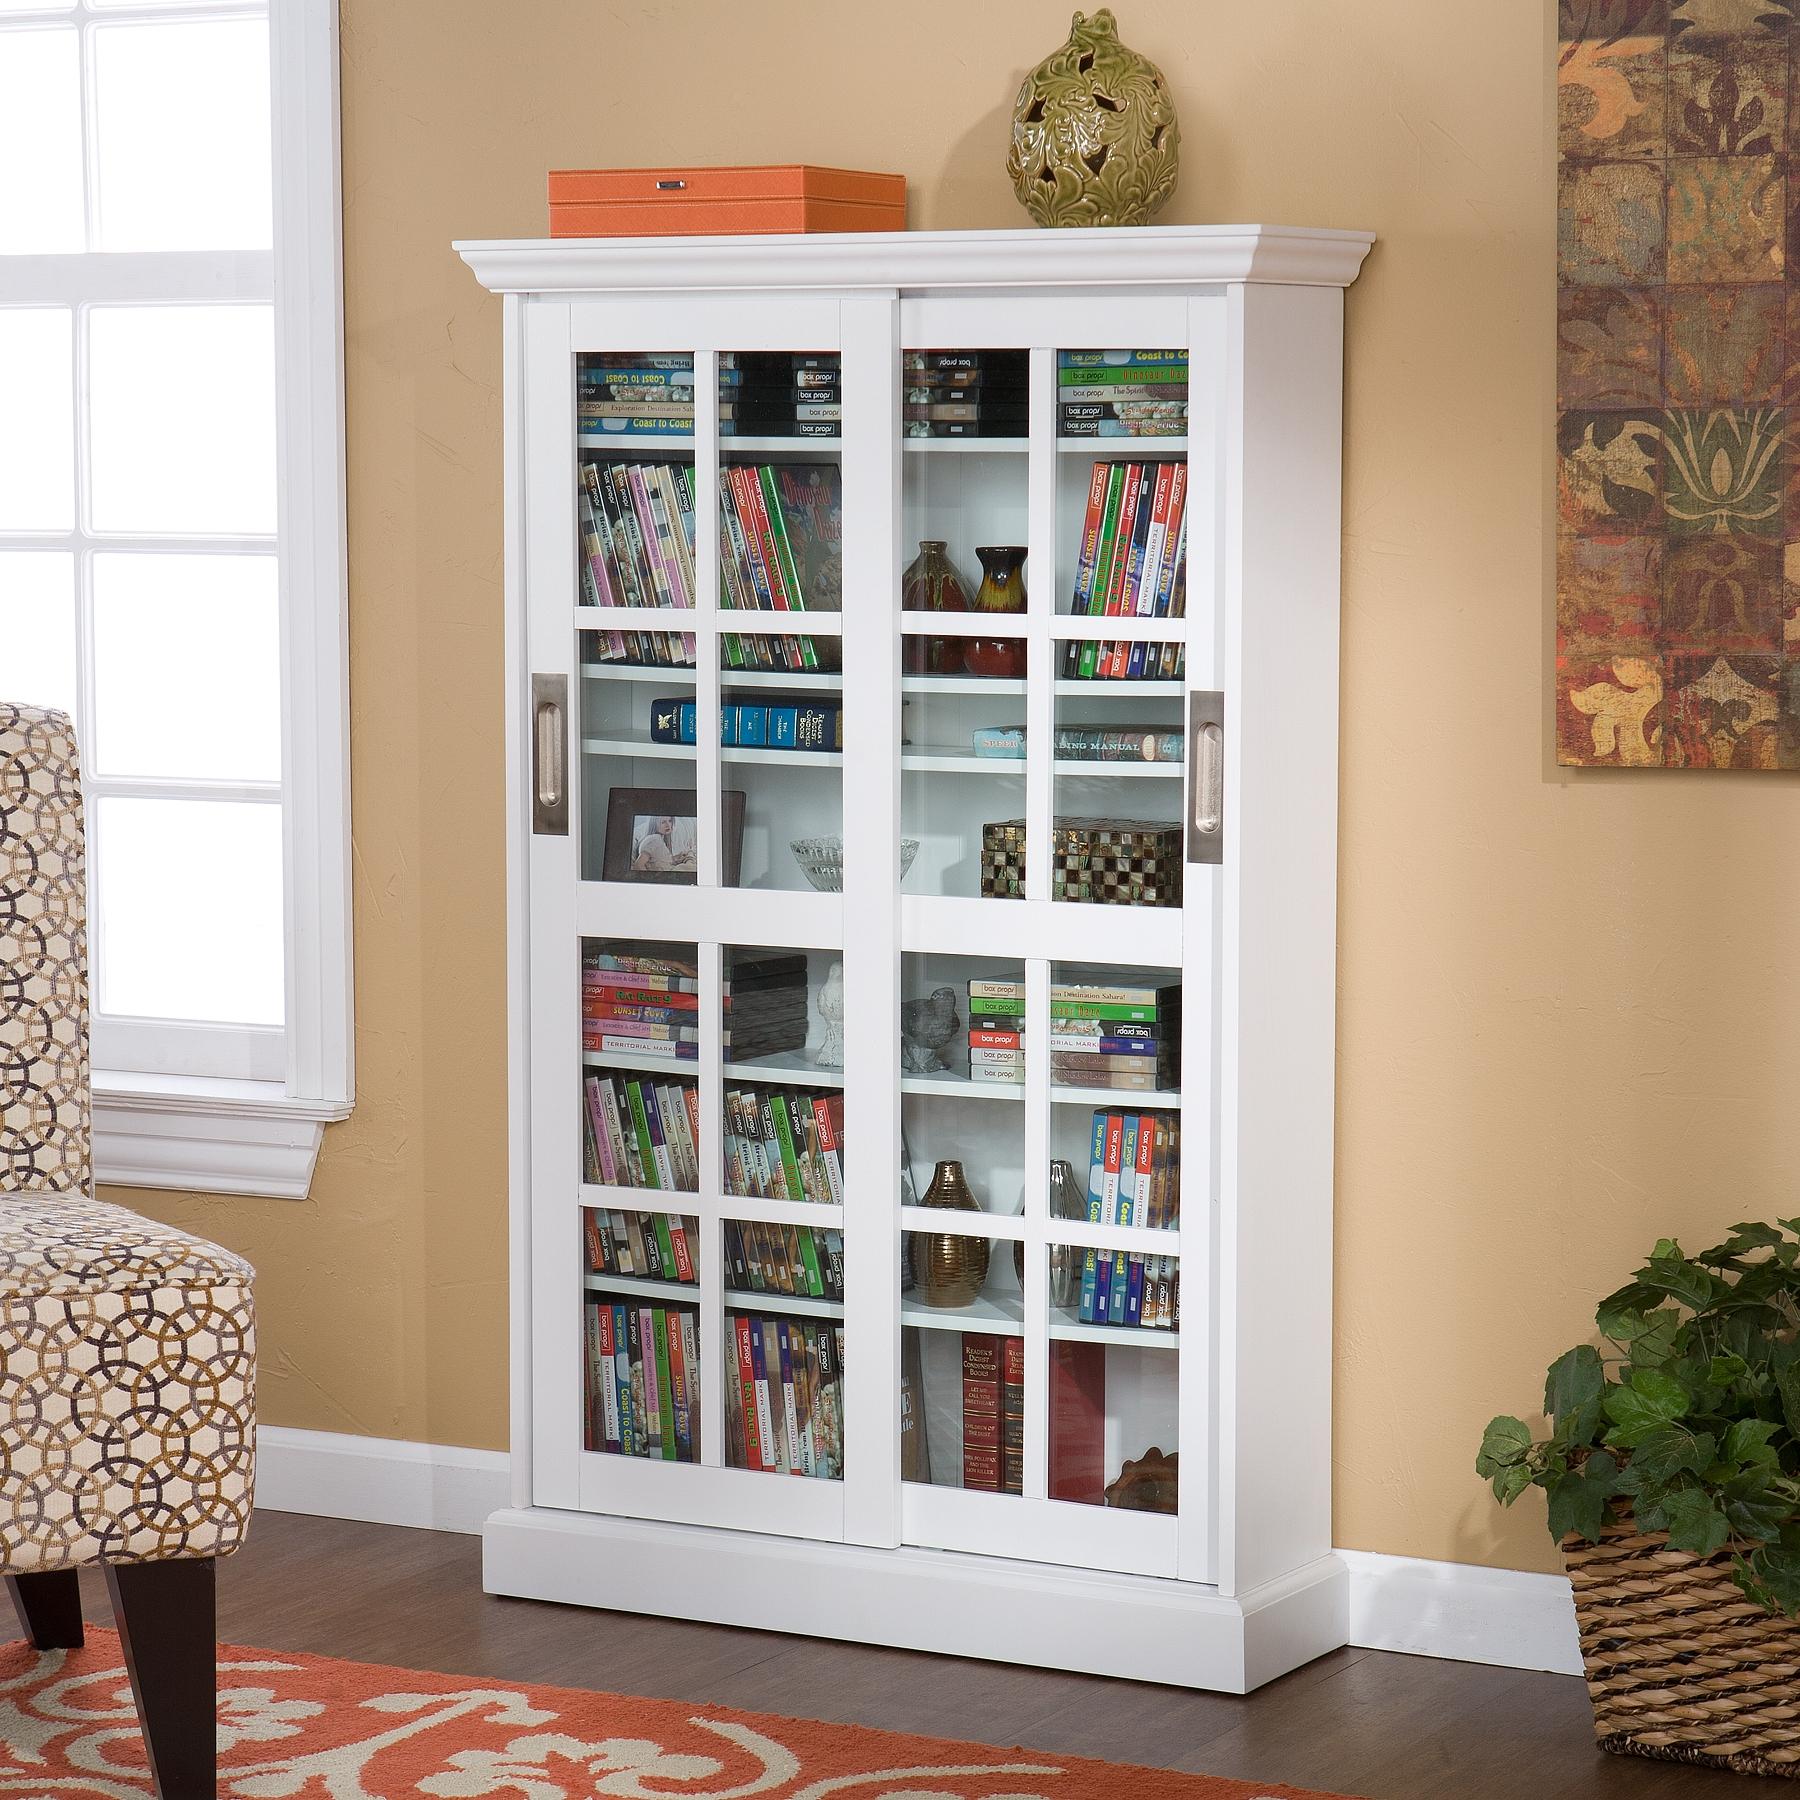 Sliding Door Cd Dvd Cabinetsolid wood cd storage dvd storage cd cabinet dvd cabinet for